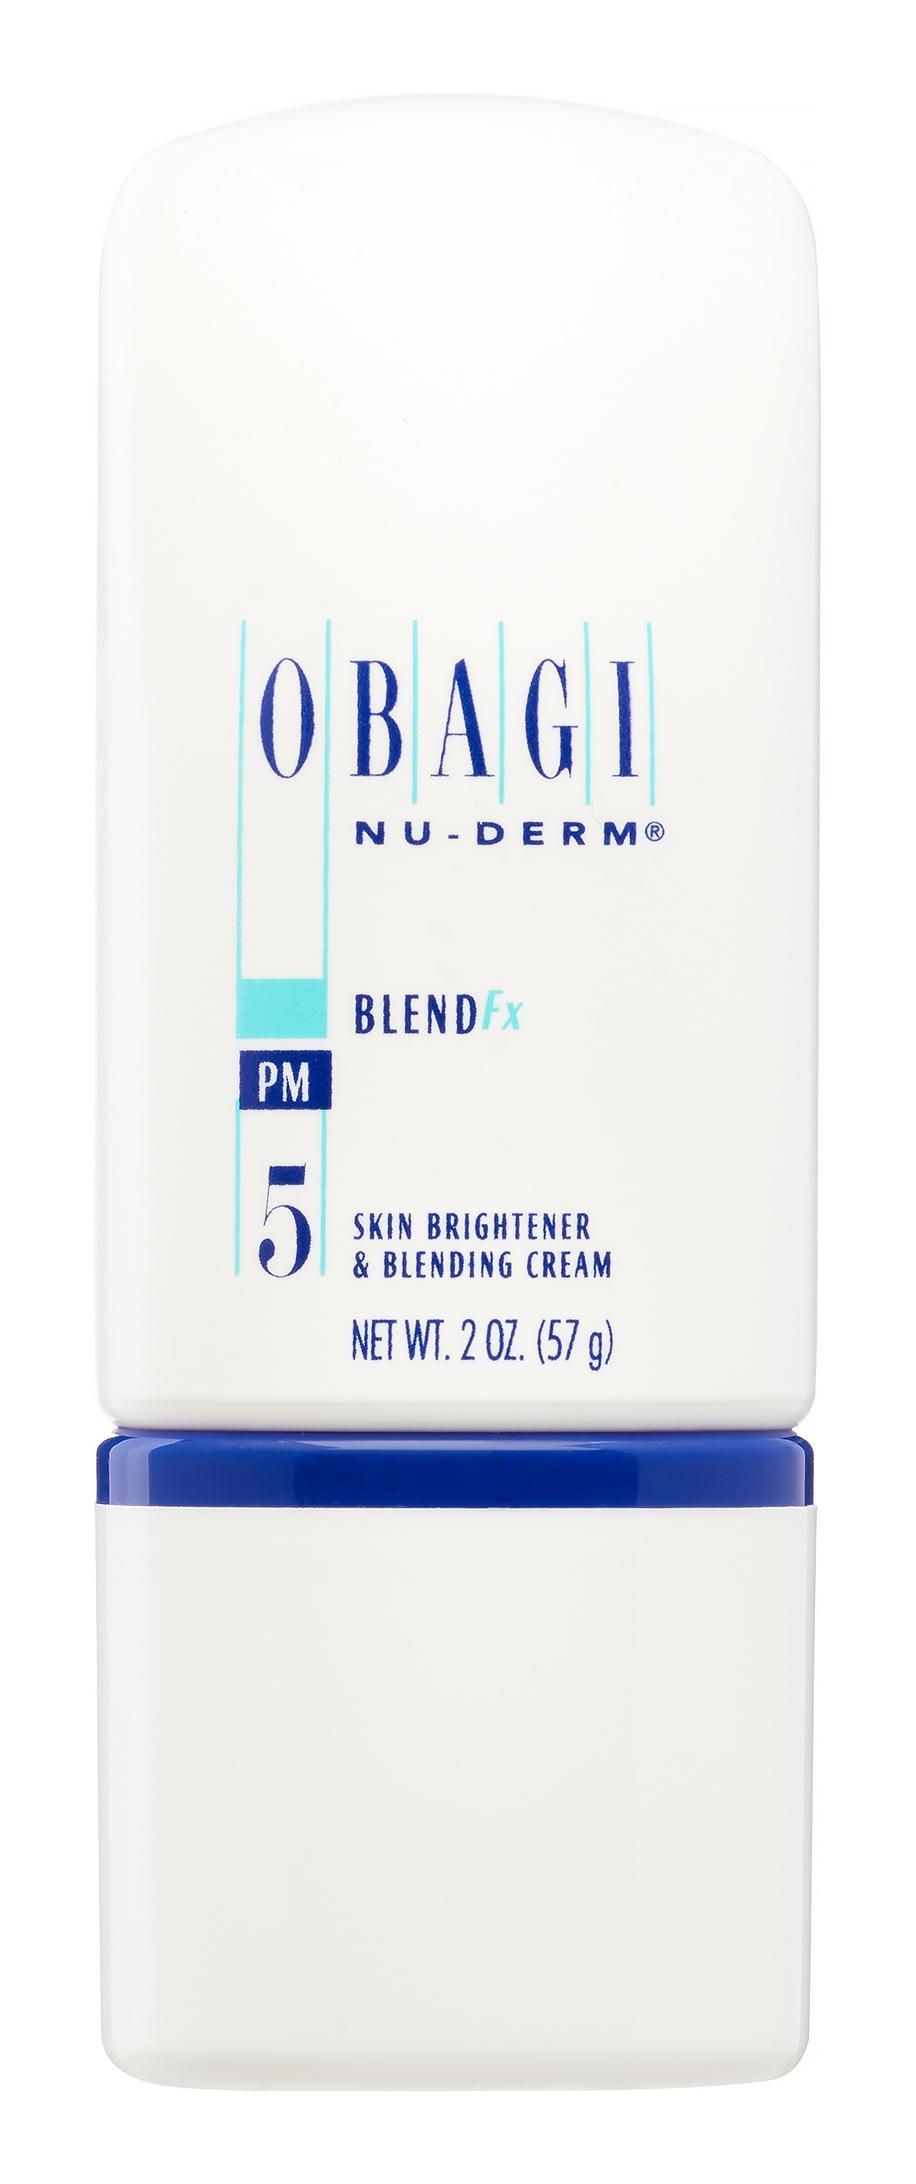 Obagi Nu Derm Bland FX Skin Brightened & Blending Cream